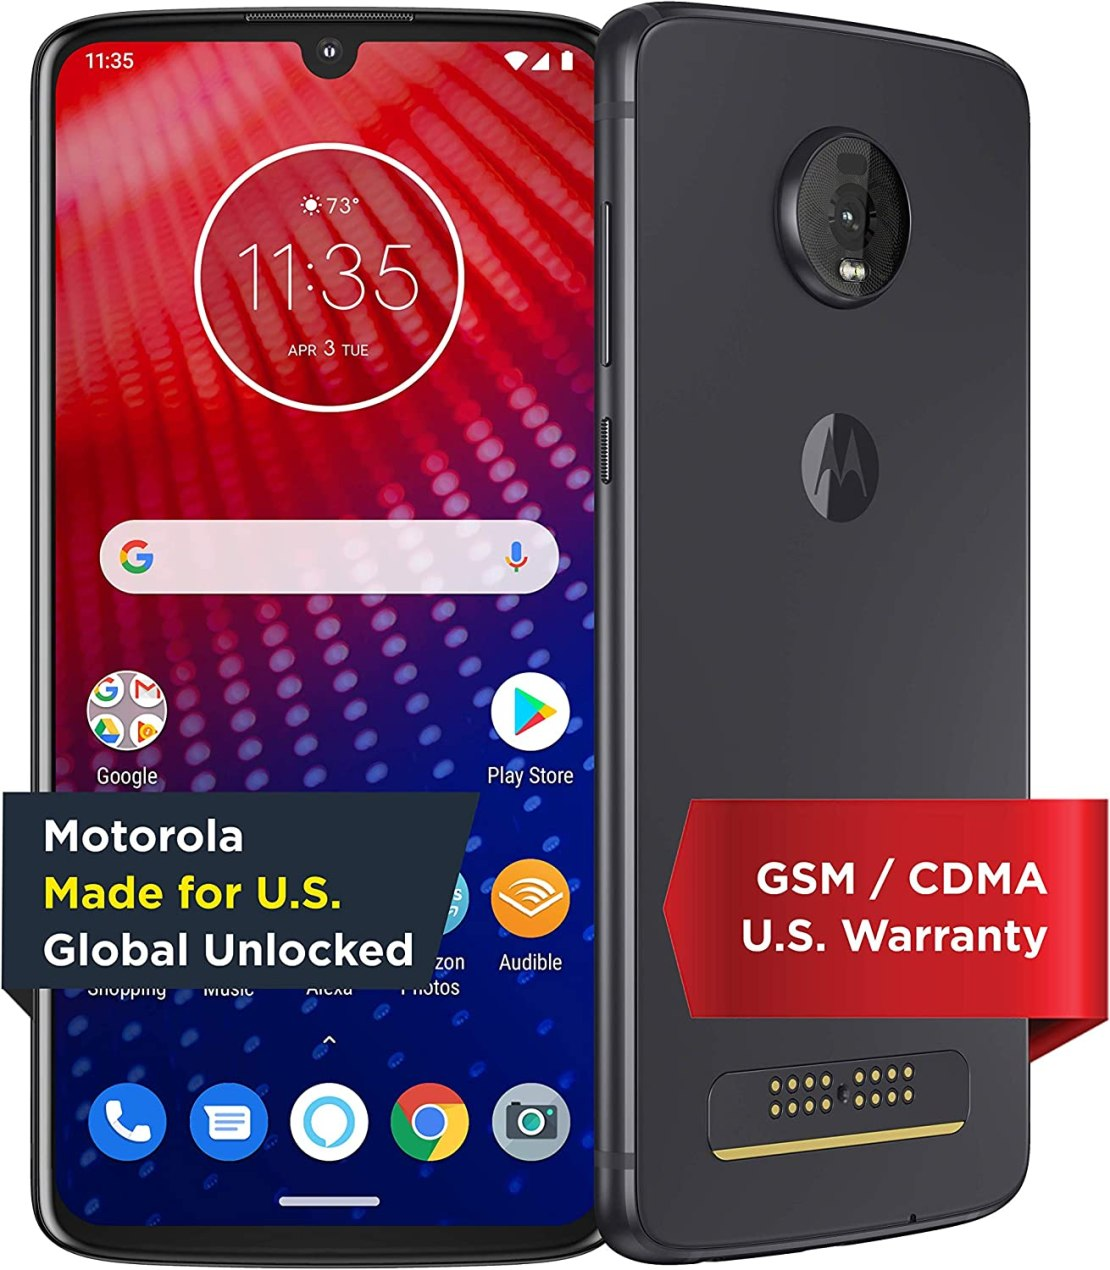 Moto Z4 with Alexa Hands-Free (Moto 360 camera included) – Unlocked – 128 GB – Flash Gray